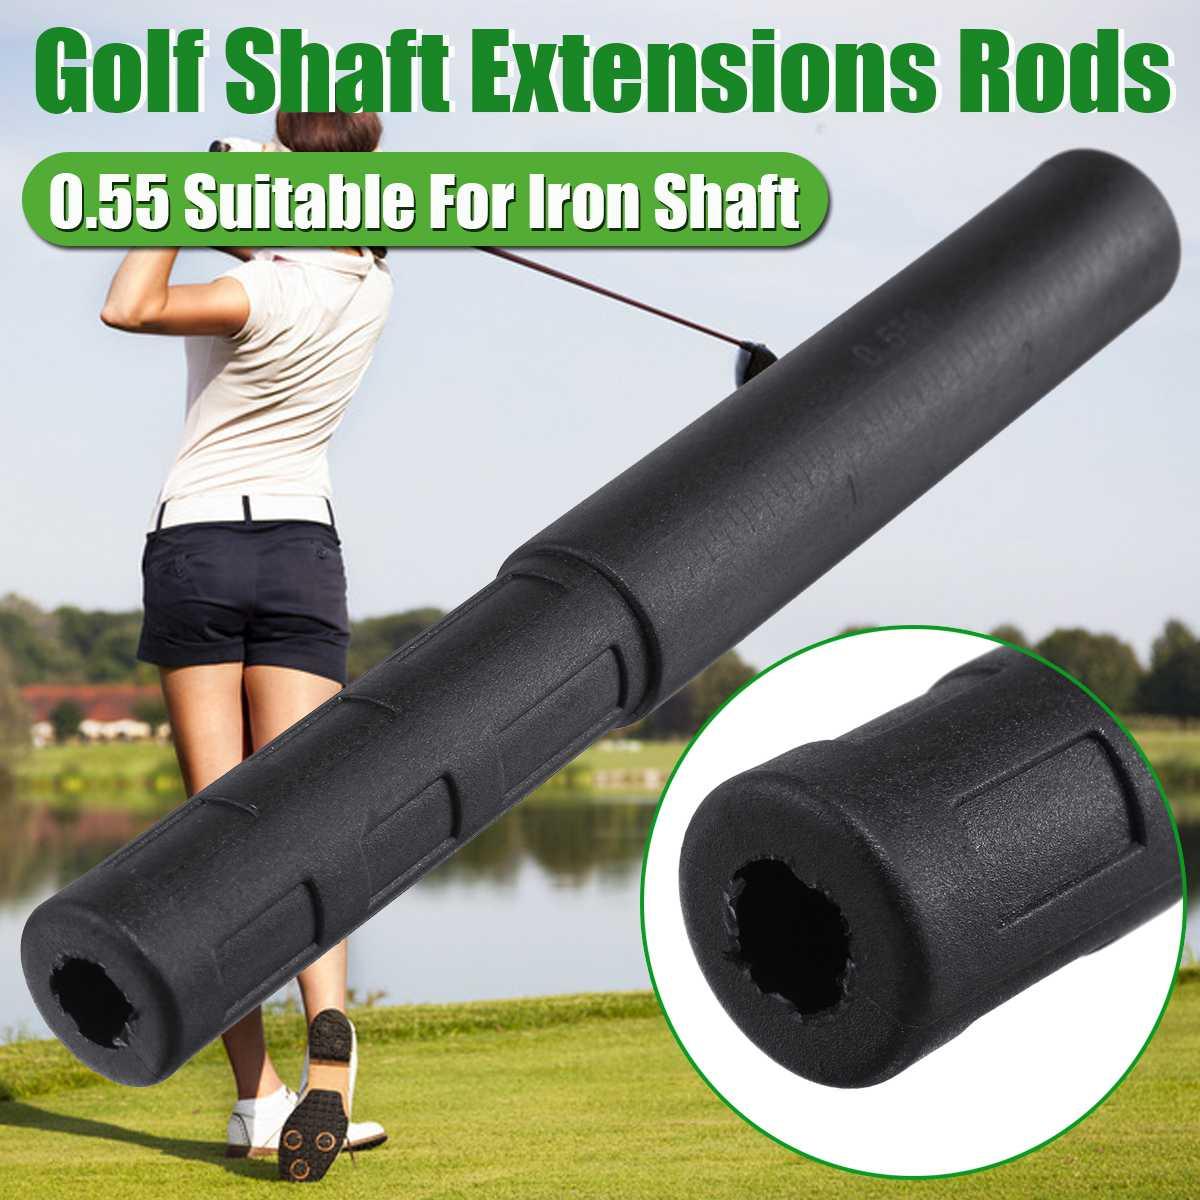 5pcs Golf Club Carbon Fiber Extension Rods Kit Butt Extender Stick For Iron / Graphite Shaft Putter Golf Accessories